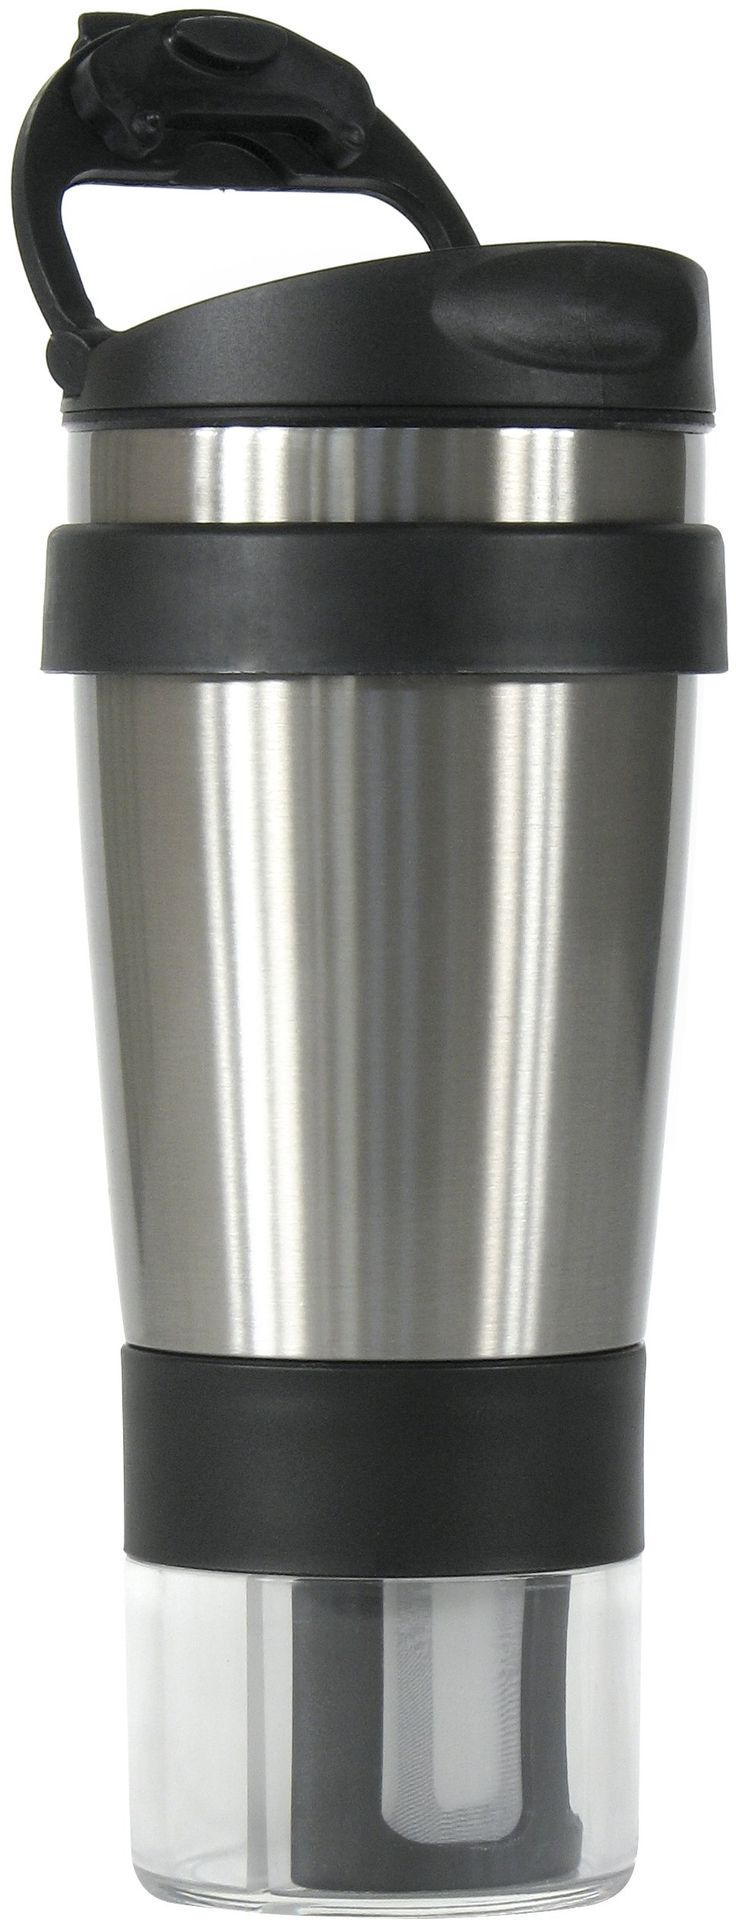 tea infuser travel mug how to use